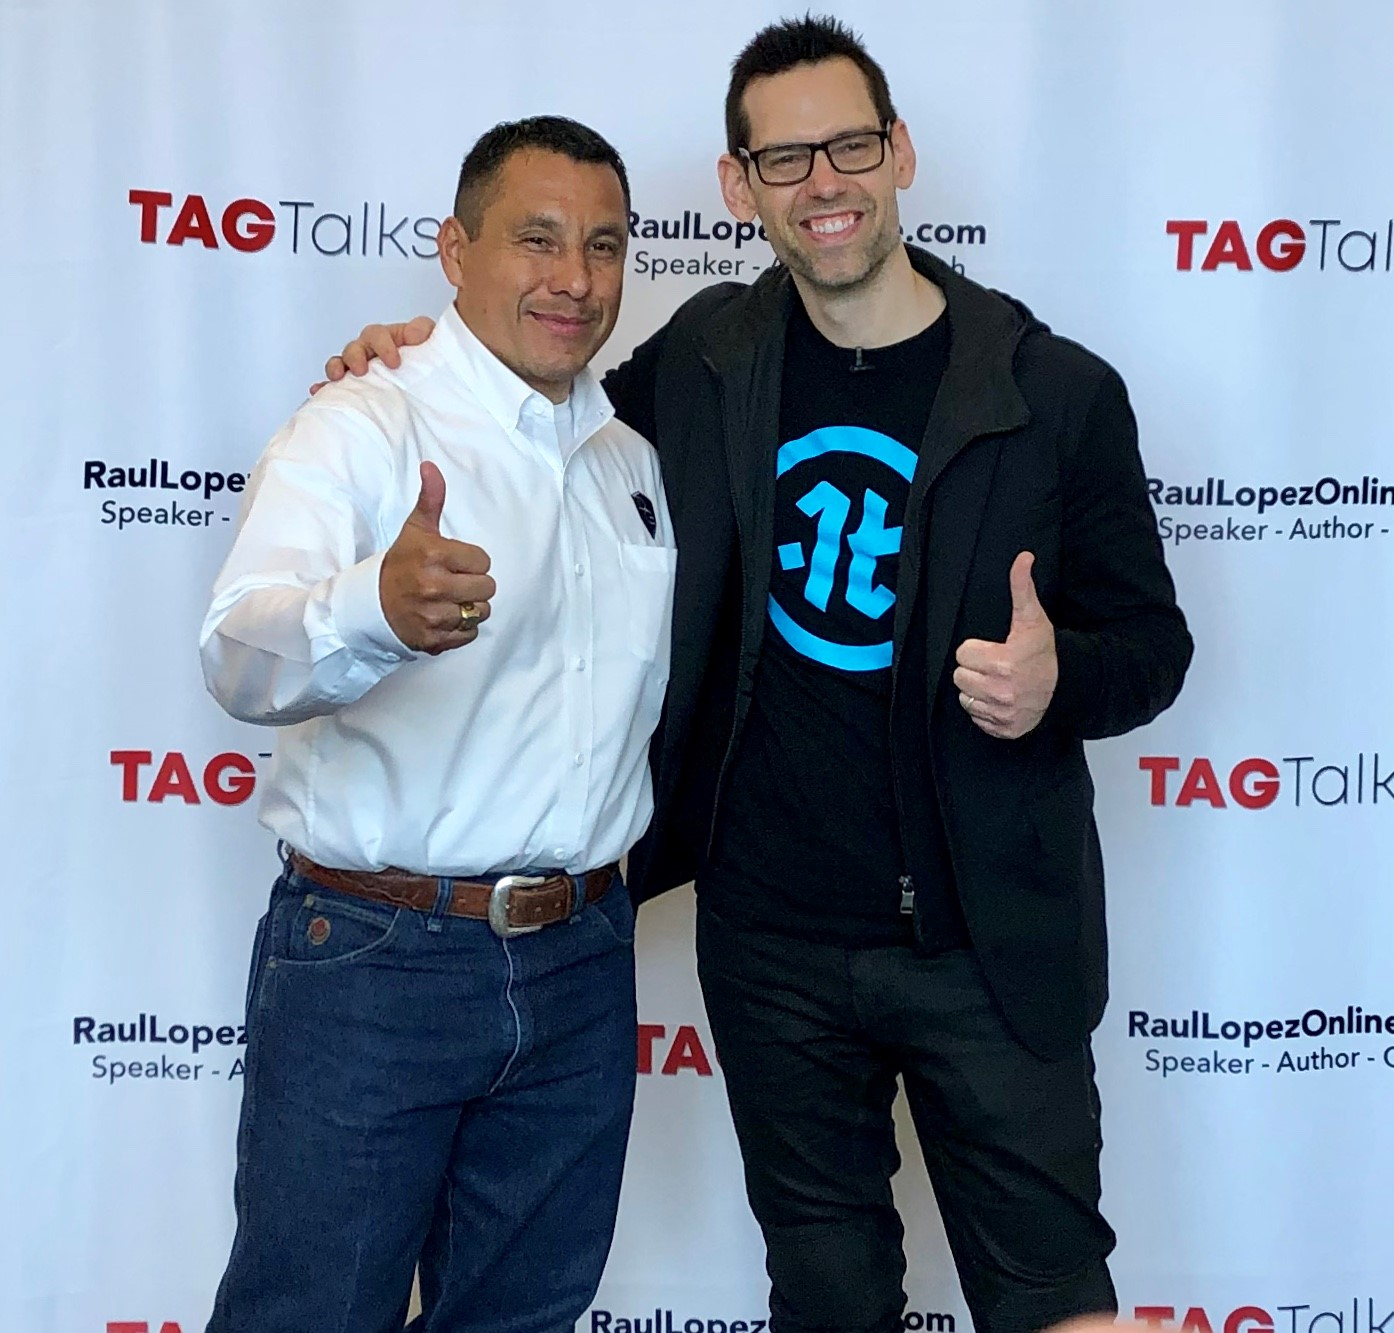 Image of Daniel Gomez Inspires San Antonio Motivational Keynote Speaker, TAG Talks, Tom Bilyeu, Confidence Coach, Leadership and Team Building, Sales Mastery, Resilience Speaker 2